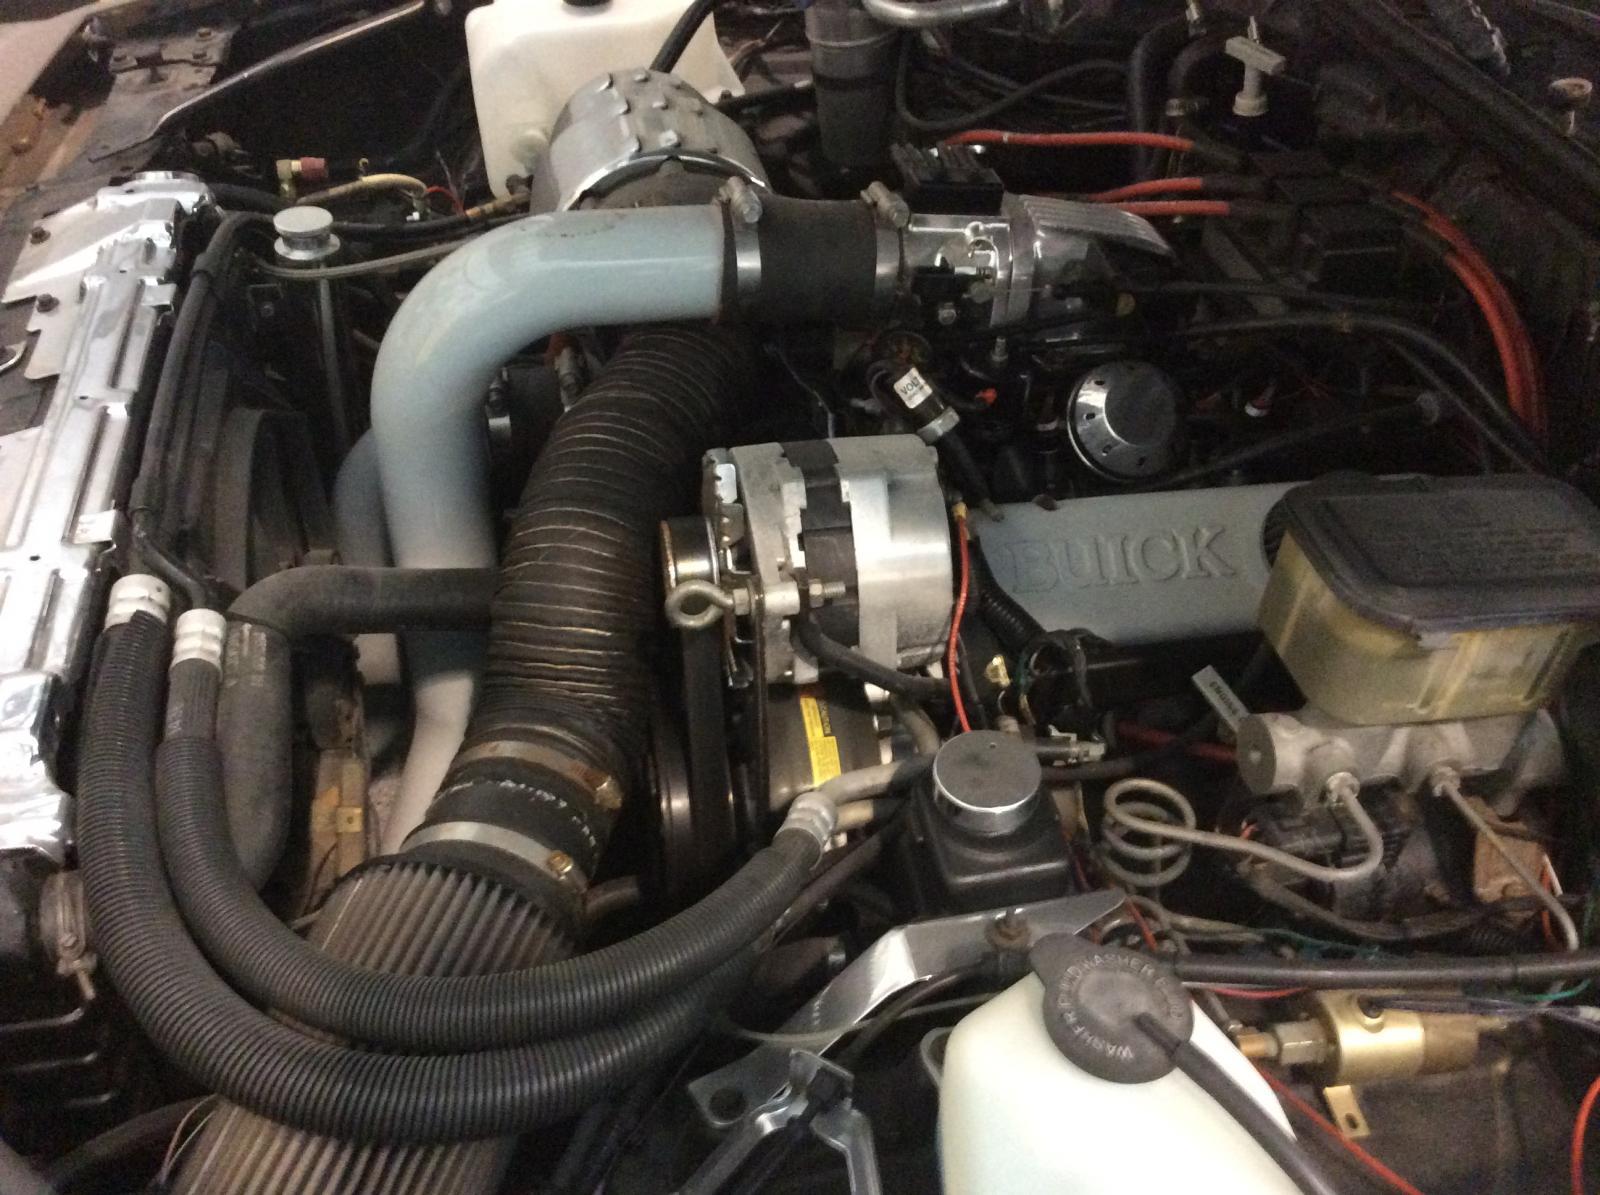 87 Turbo T for sale in TX-3d75871e-9b80-4356-a596-5b9cd98acf37.jpg